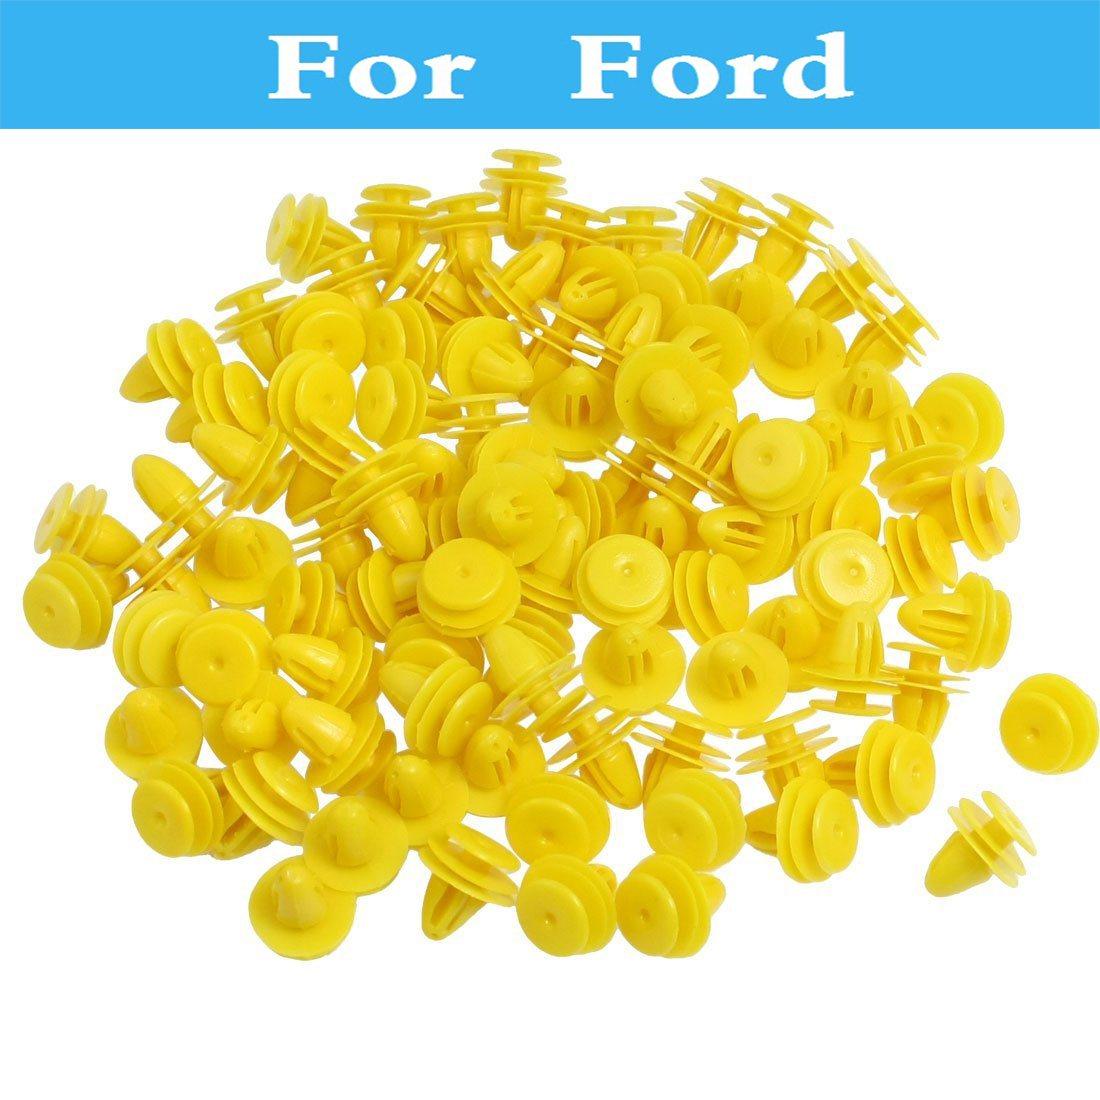 100pcs Yellow Plastic Rivet Car Door Trim Panel Clips For Ford Gt Ka Kuga X Thunderbird Fusion Maverick Mondeo St Mustang Taurus